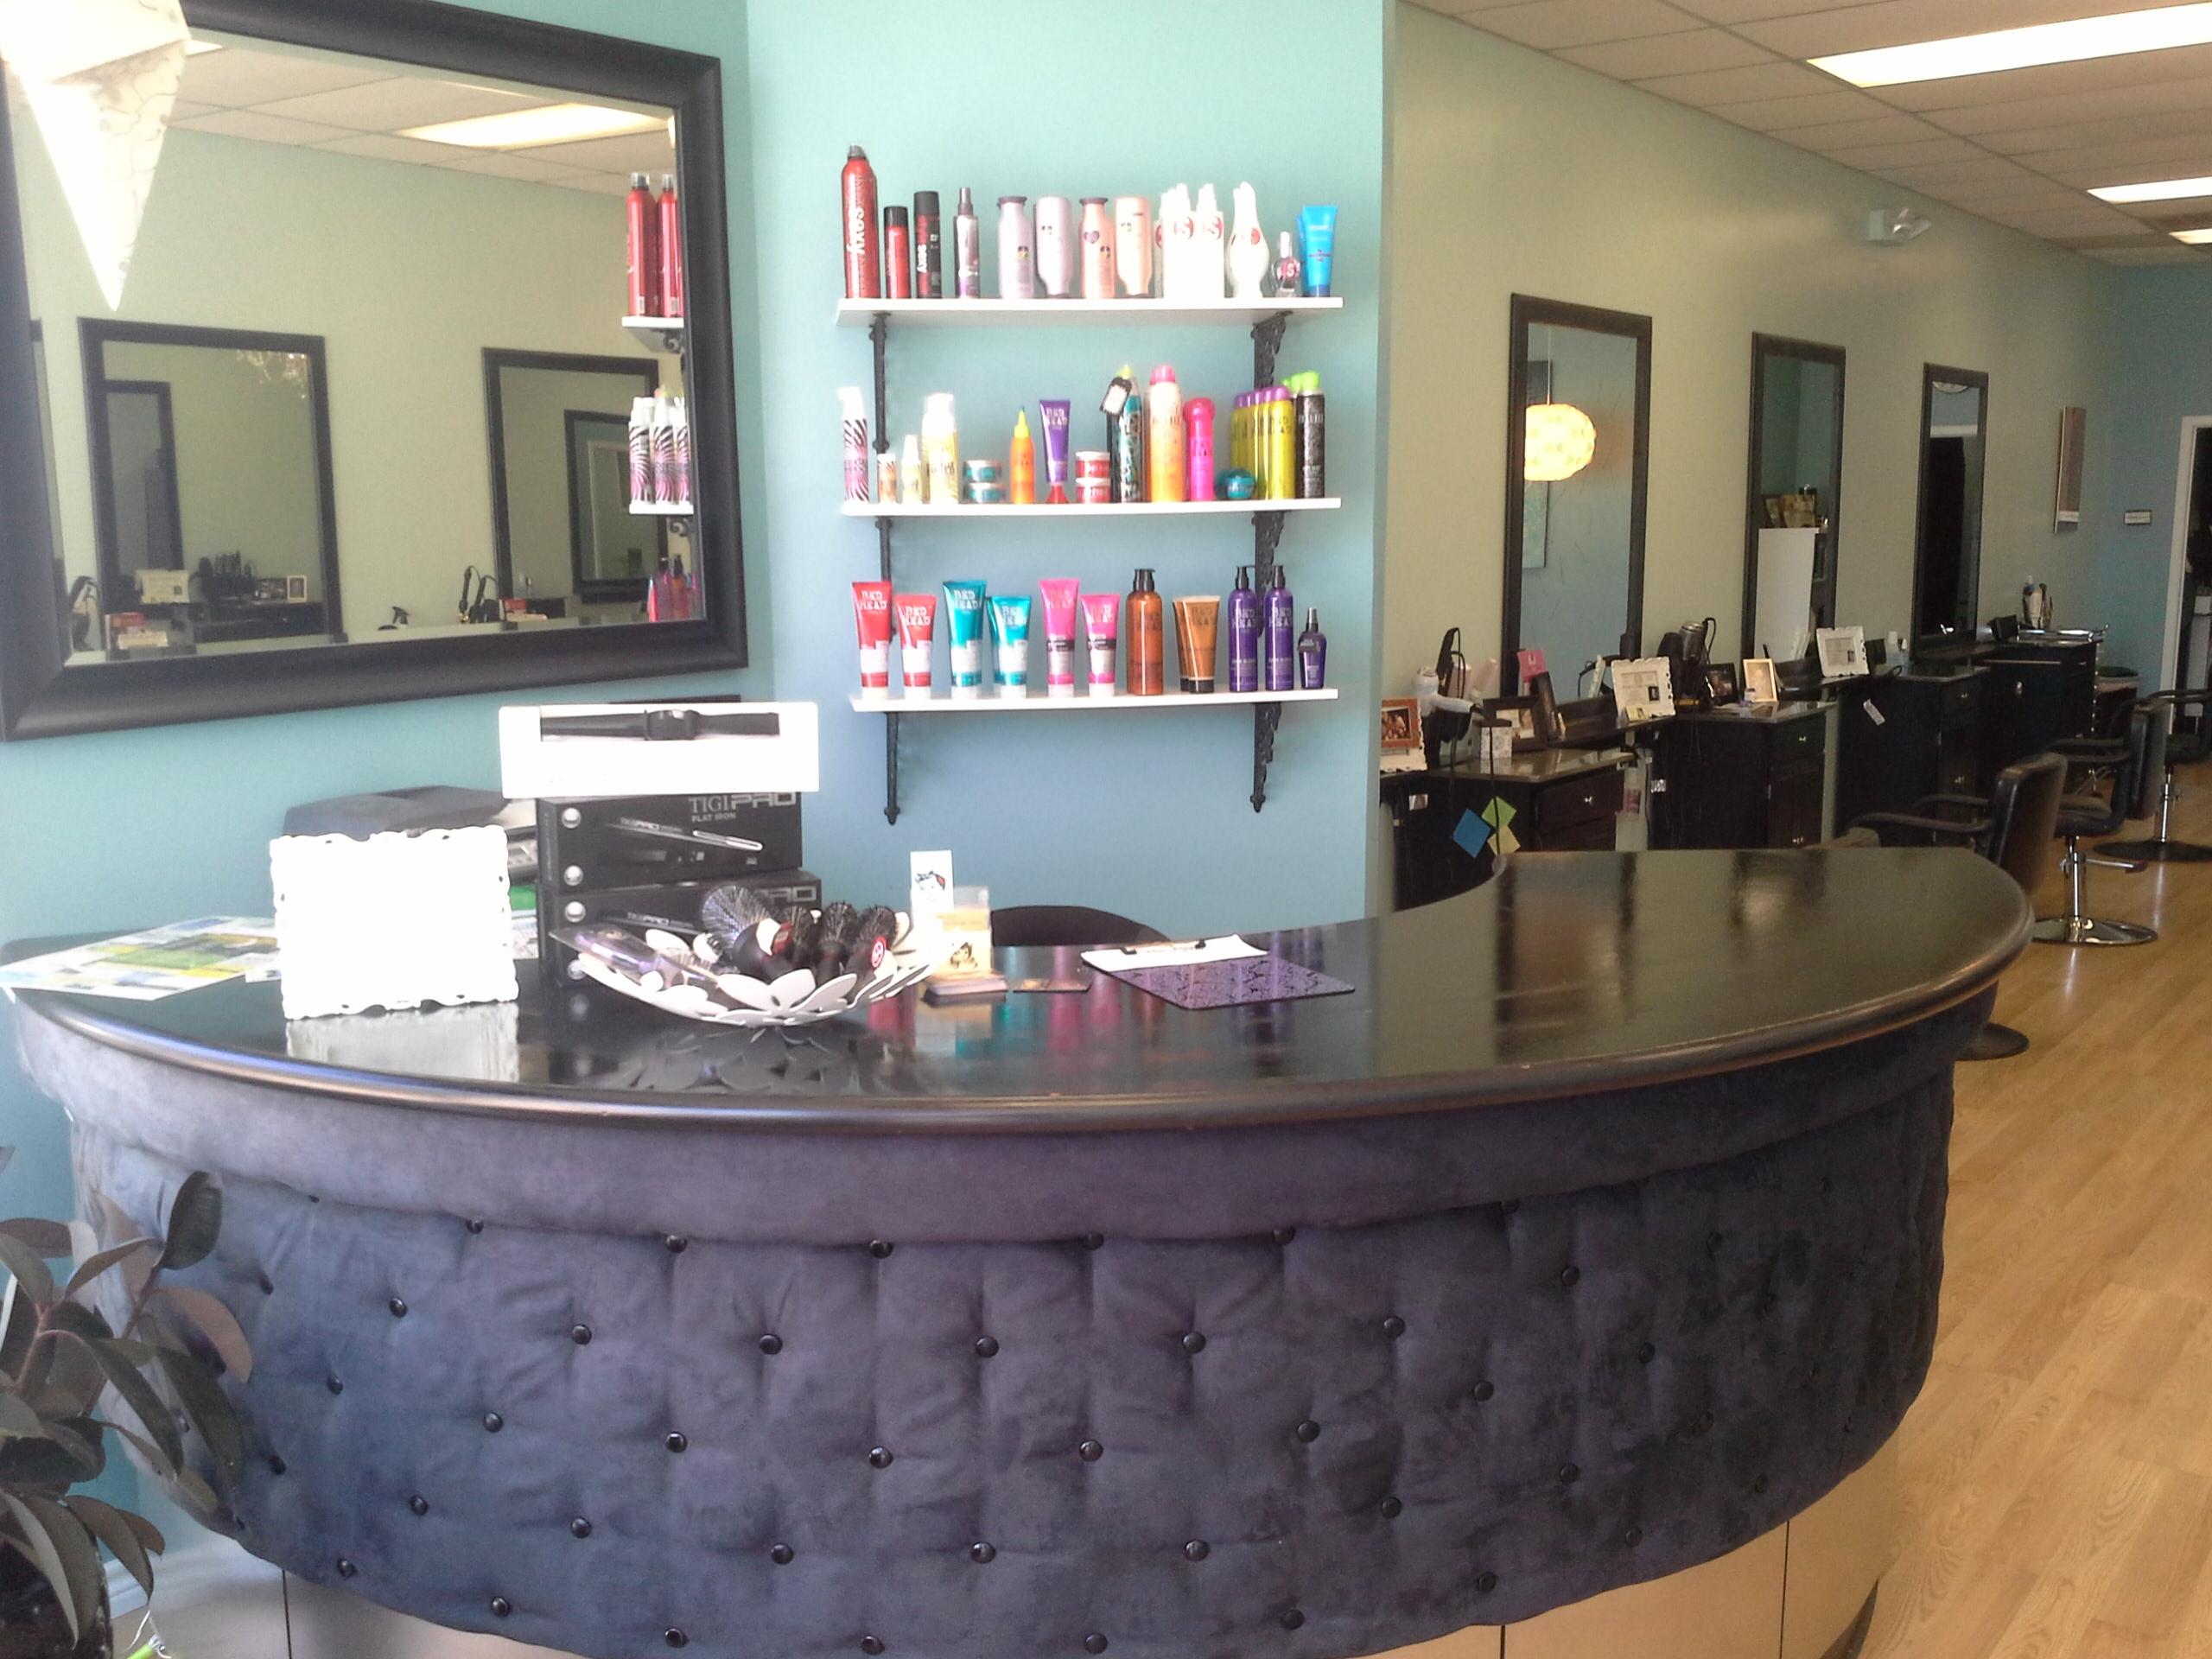 Bettie Bangs Salon image 37